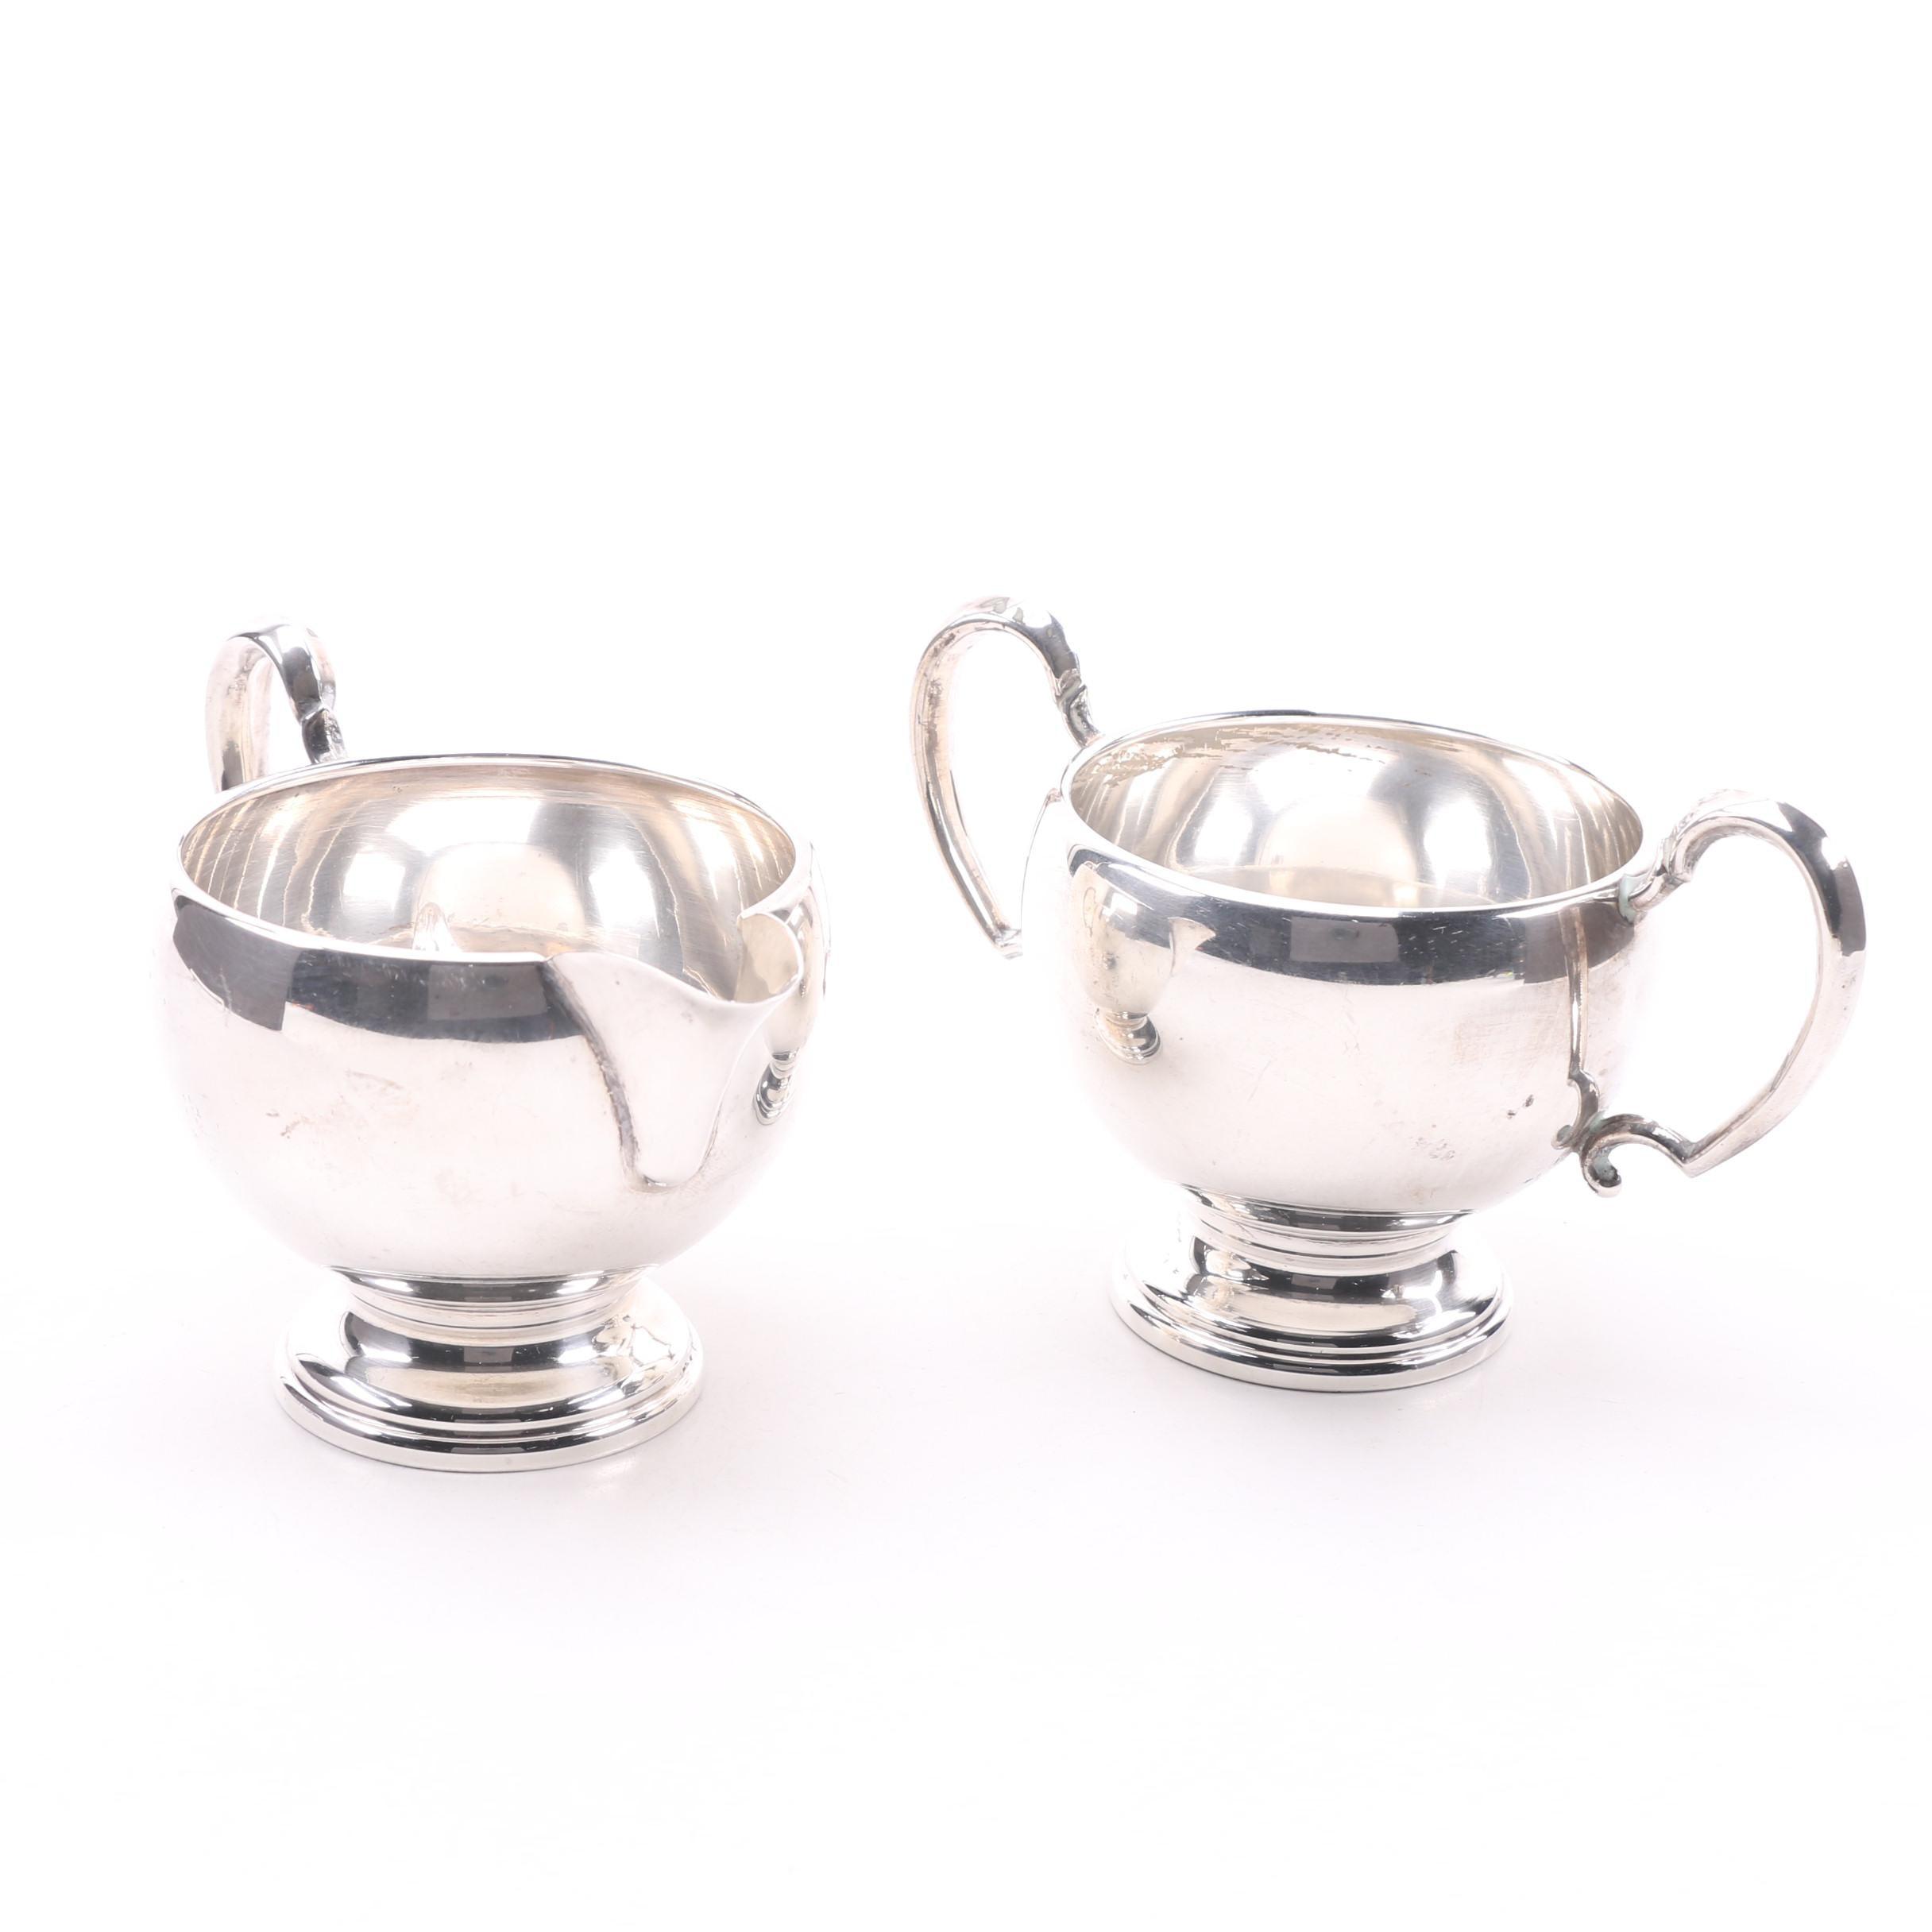 Hunt Silver Co. Sterling Silver Sugar Bowl and Creamer Set, Circa 1930s-1940s